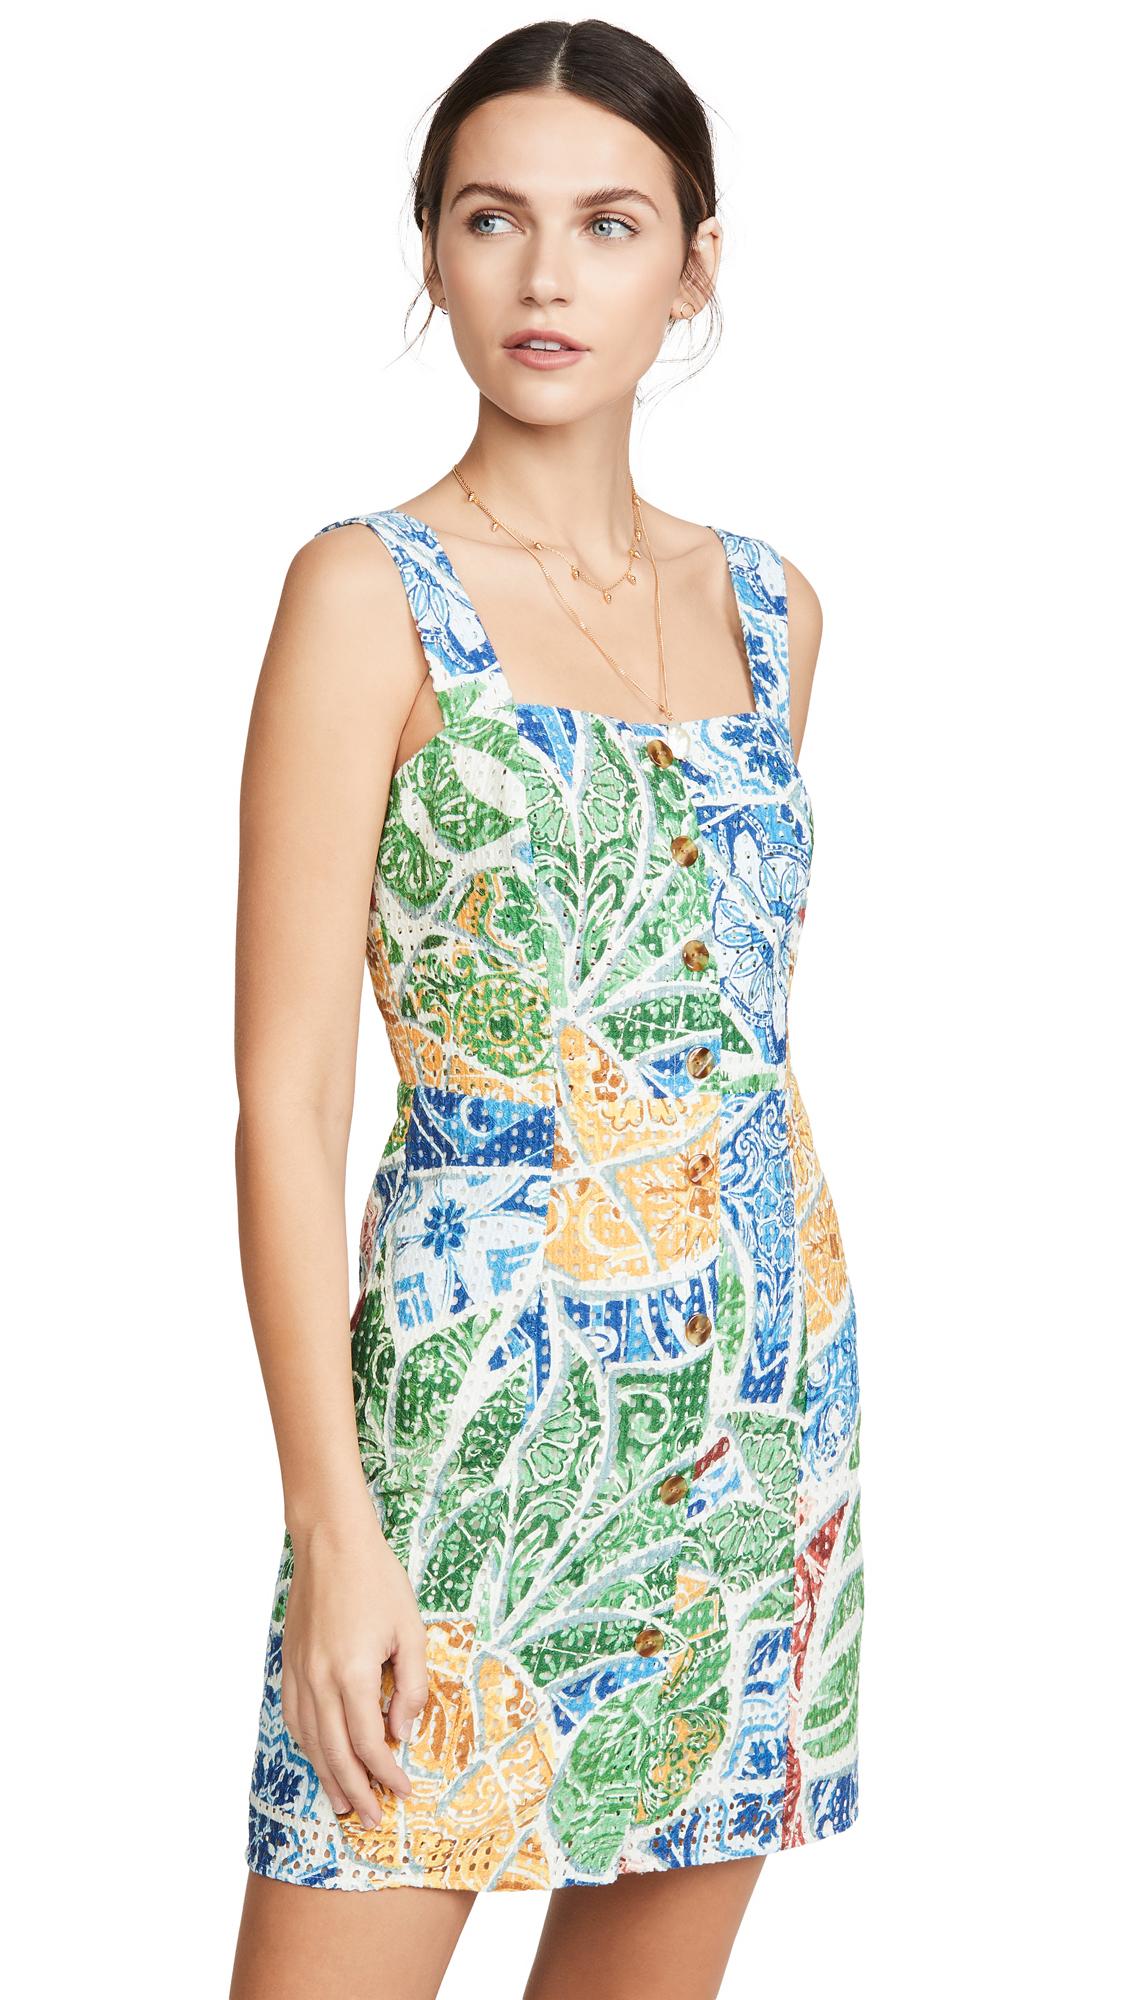 FARM Rio Tropical Tile Mini Dress - 30% Off Sale